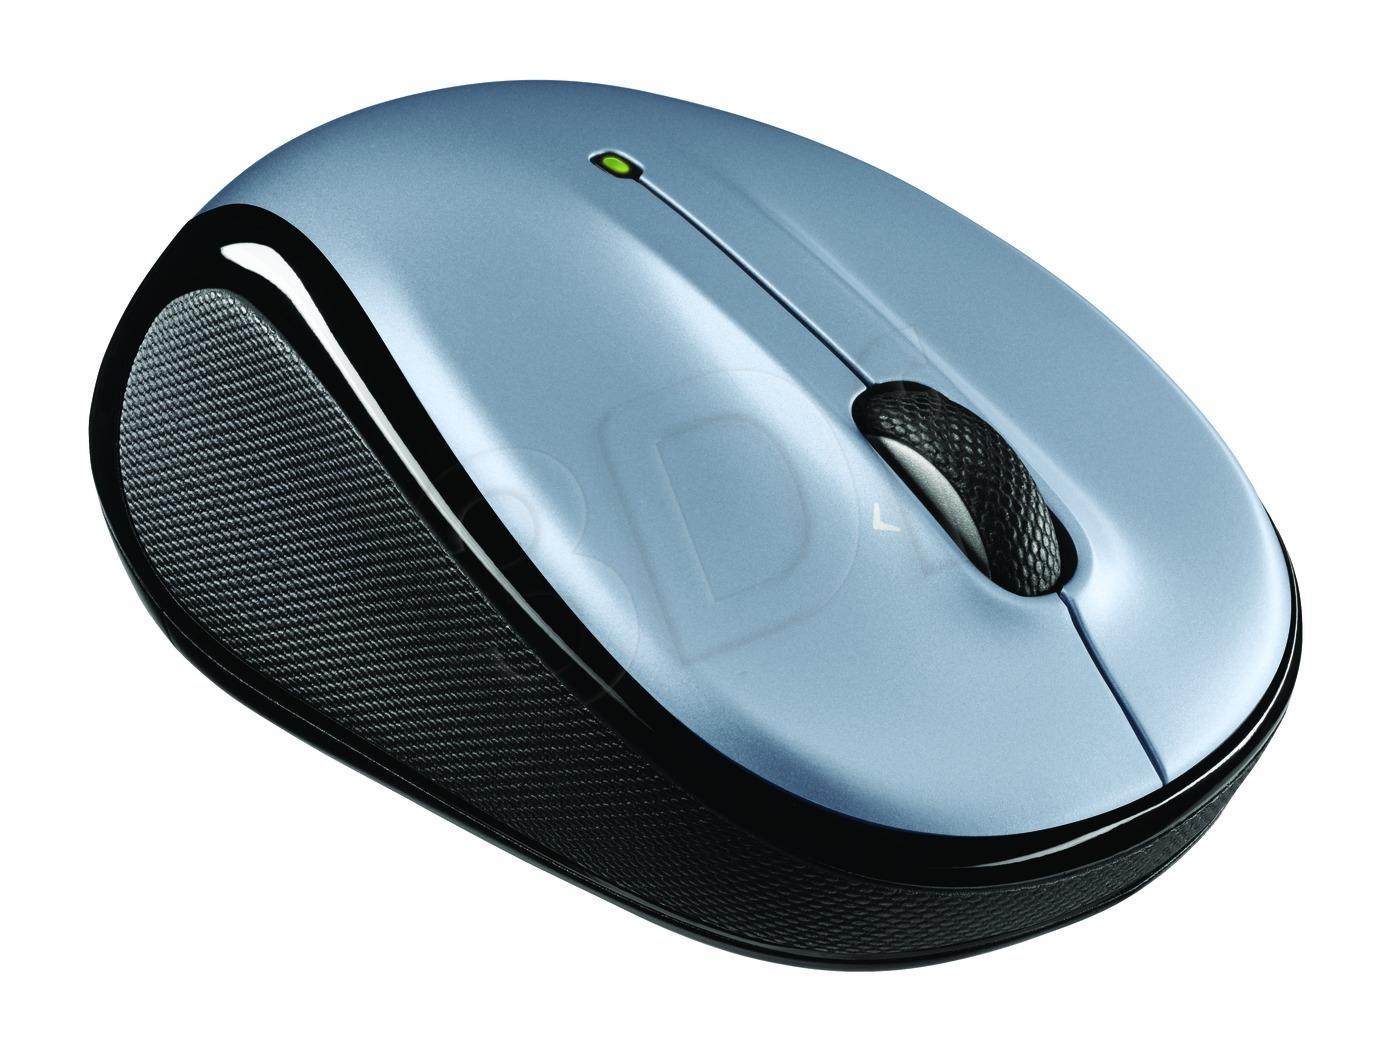 Logitech M325, Wireless light silver Datora pele